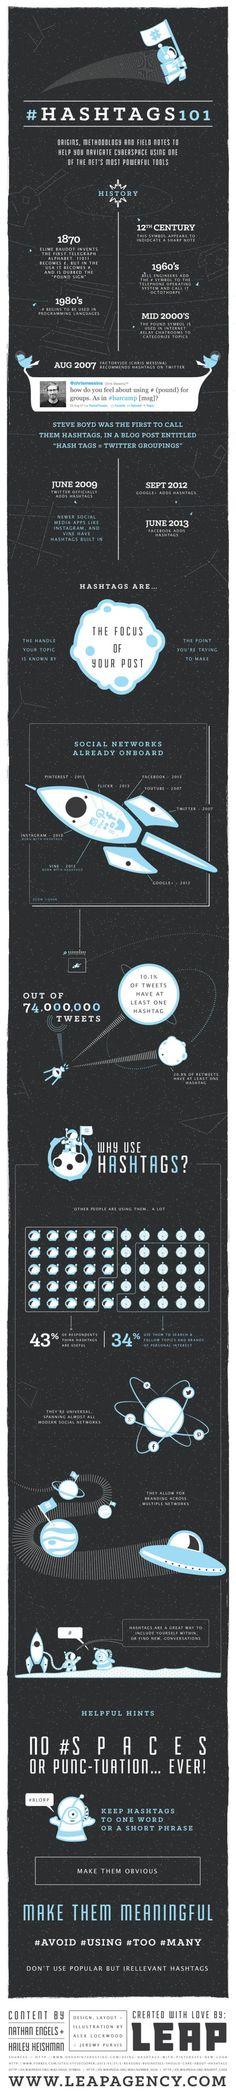 #Infographie : le Hashtag favorise les retweets #socialmedia #viral via @frenchweb